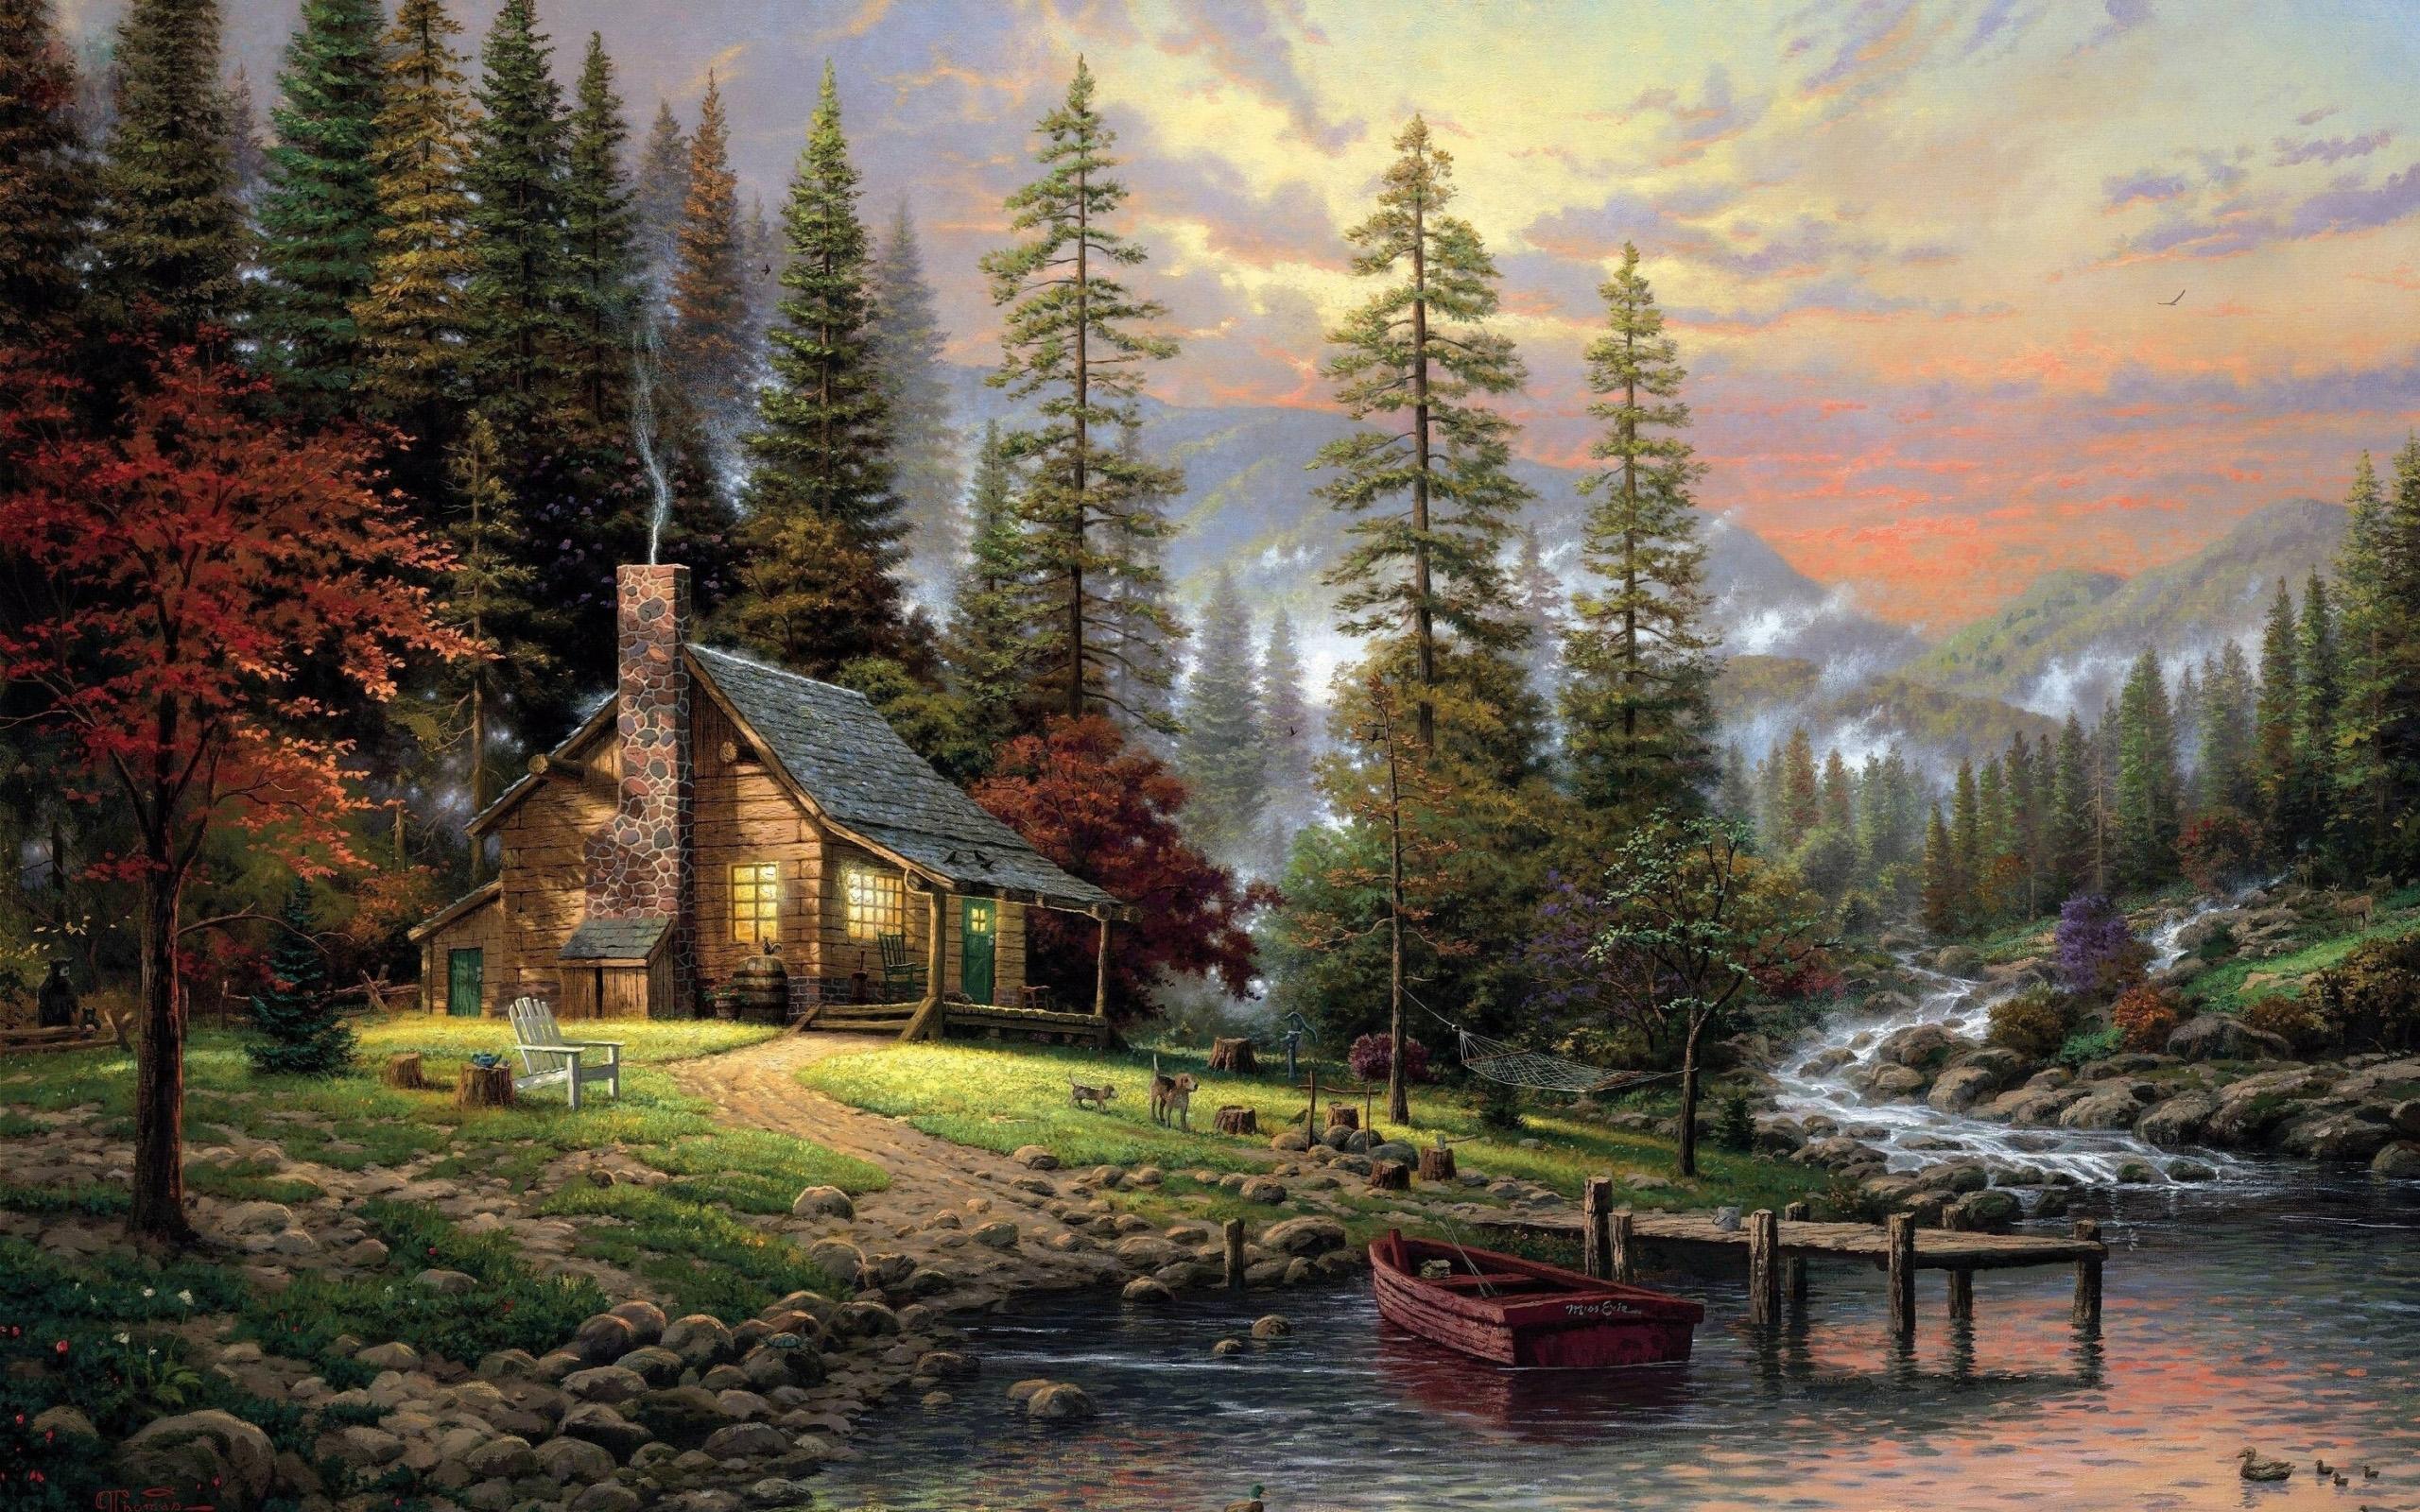 Nature Paintings Wallpaper 2560x1600